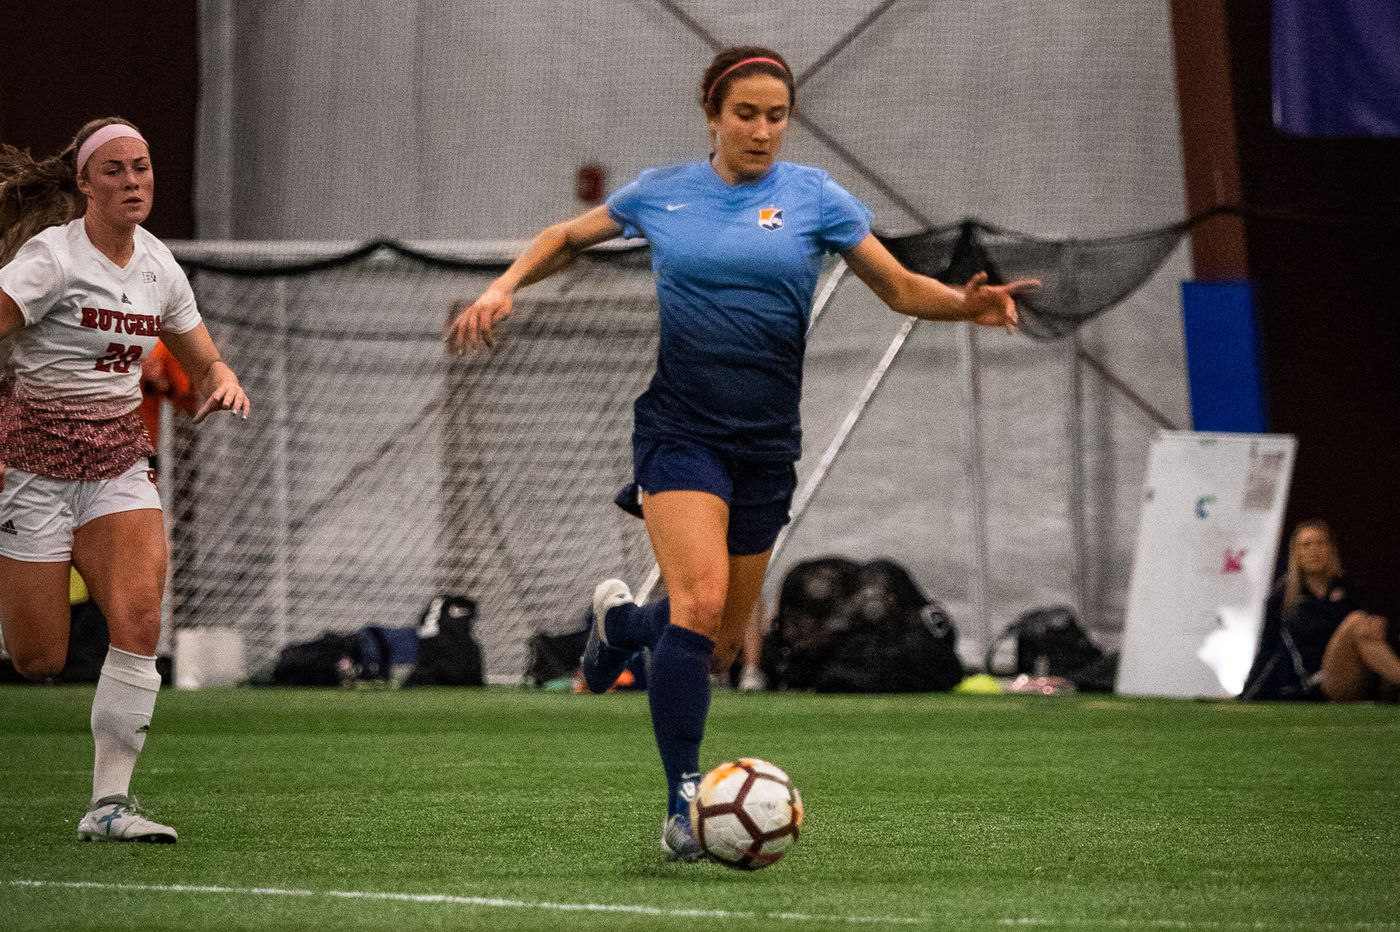 Bucks County native Jen Hoy optimistic about Sky Blue FC's potential as NWSL season kicks off